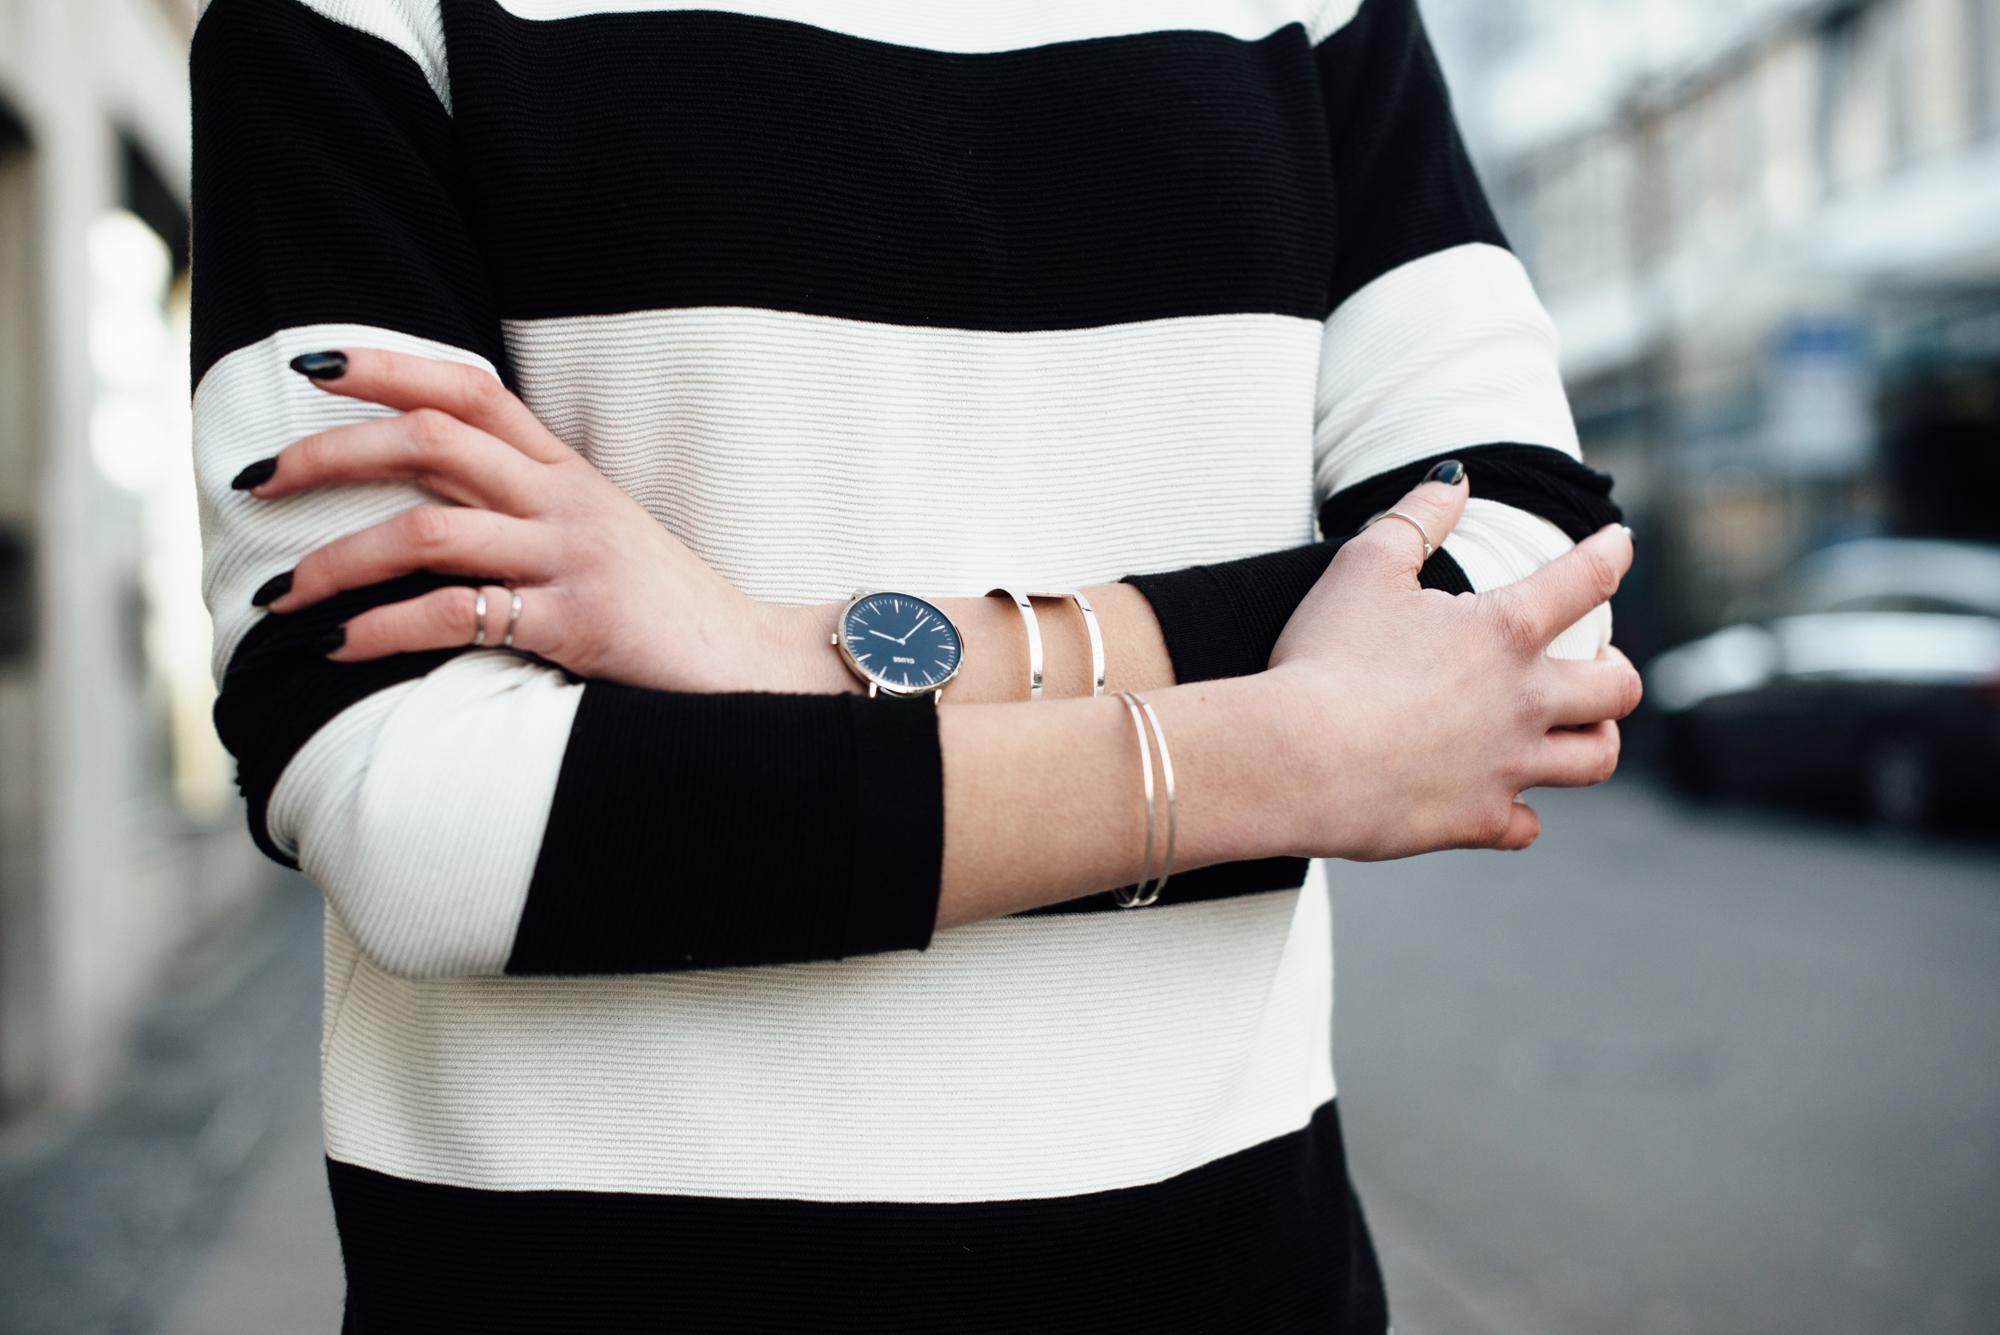 Zalando Taschen Guide_Calvin Klein Tasche_Kiamisu_Modeblog_Fashionblog_final2